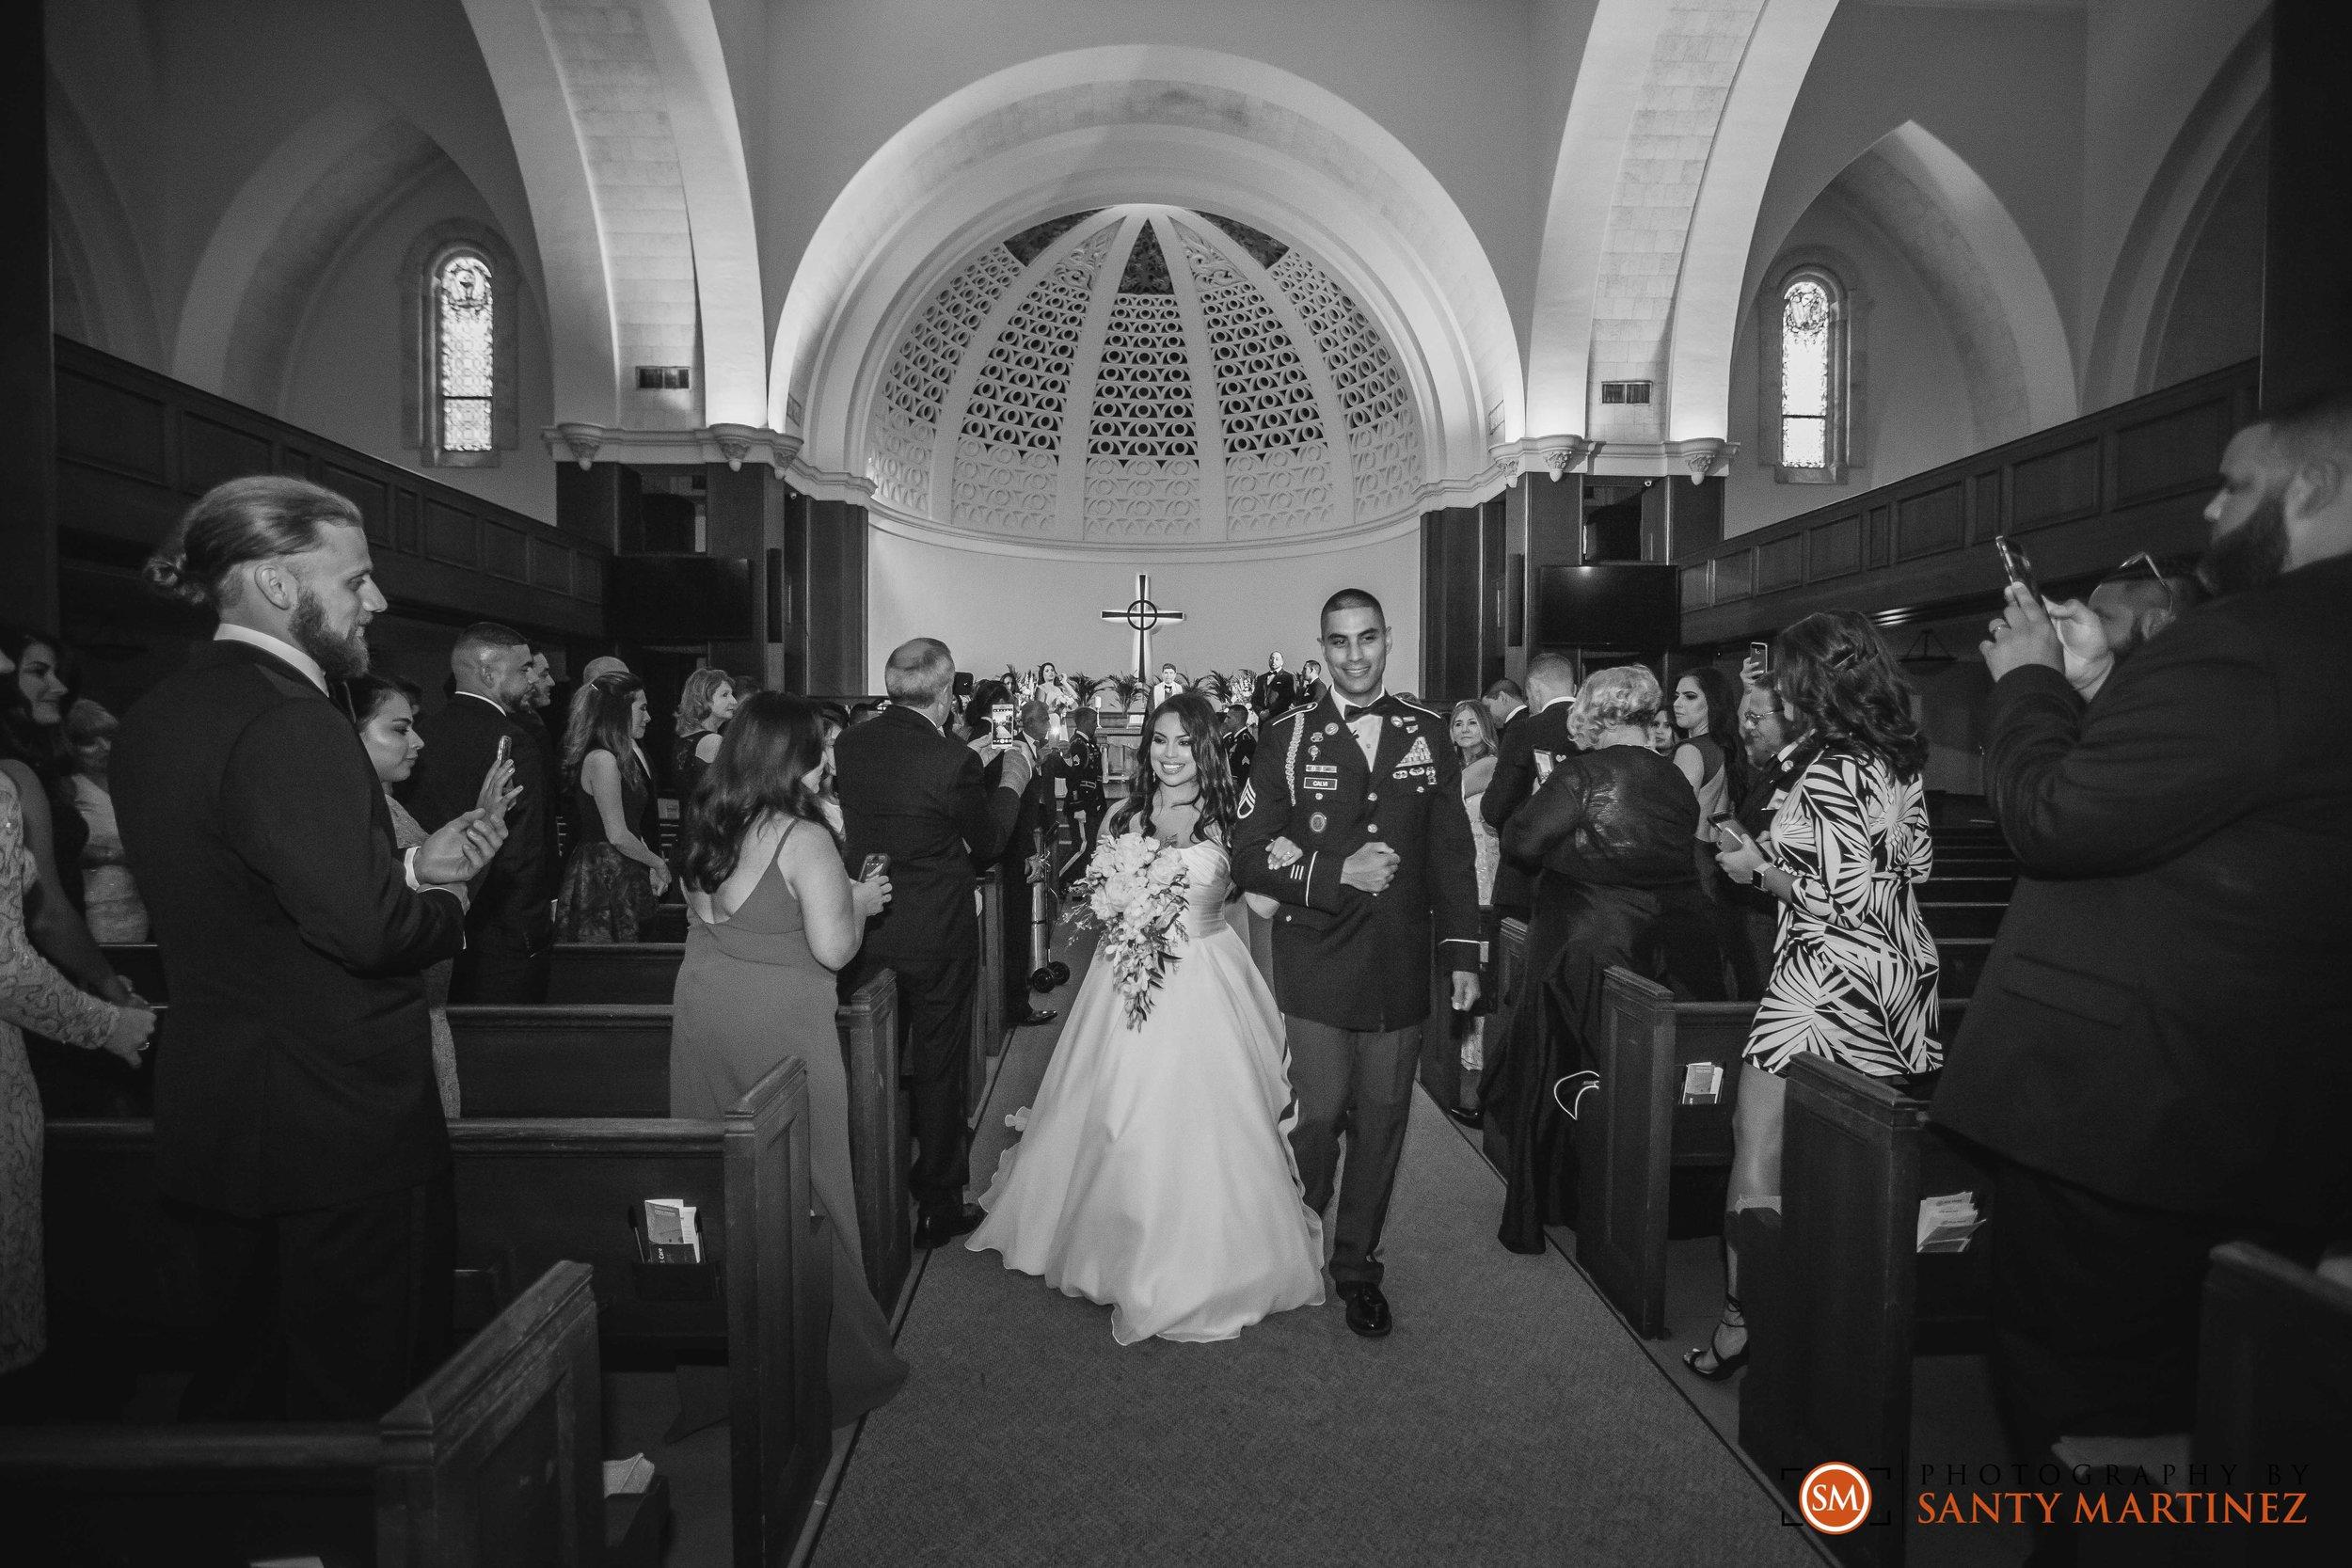 Wedding First Miami Presbyterian Church - Photography by Santy Martinez-24.jpg